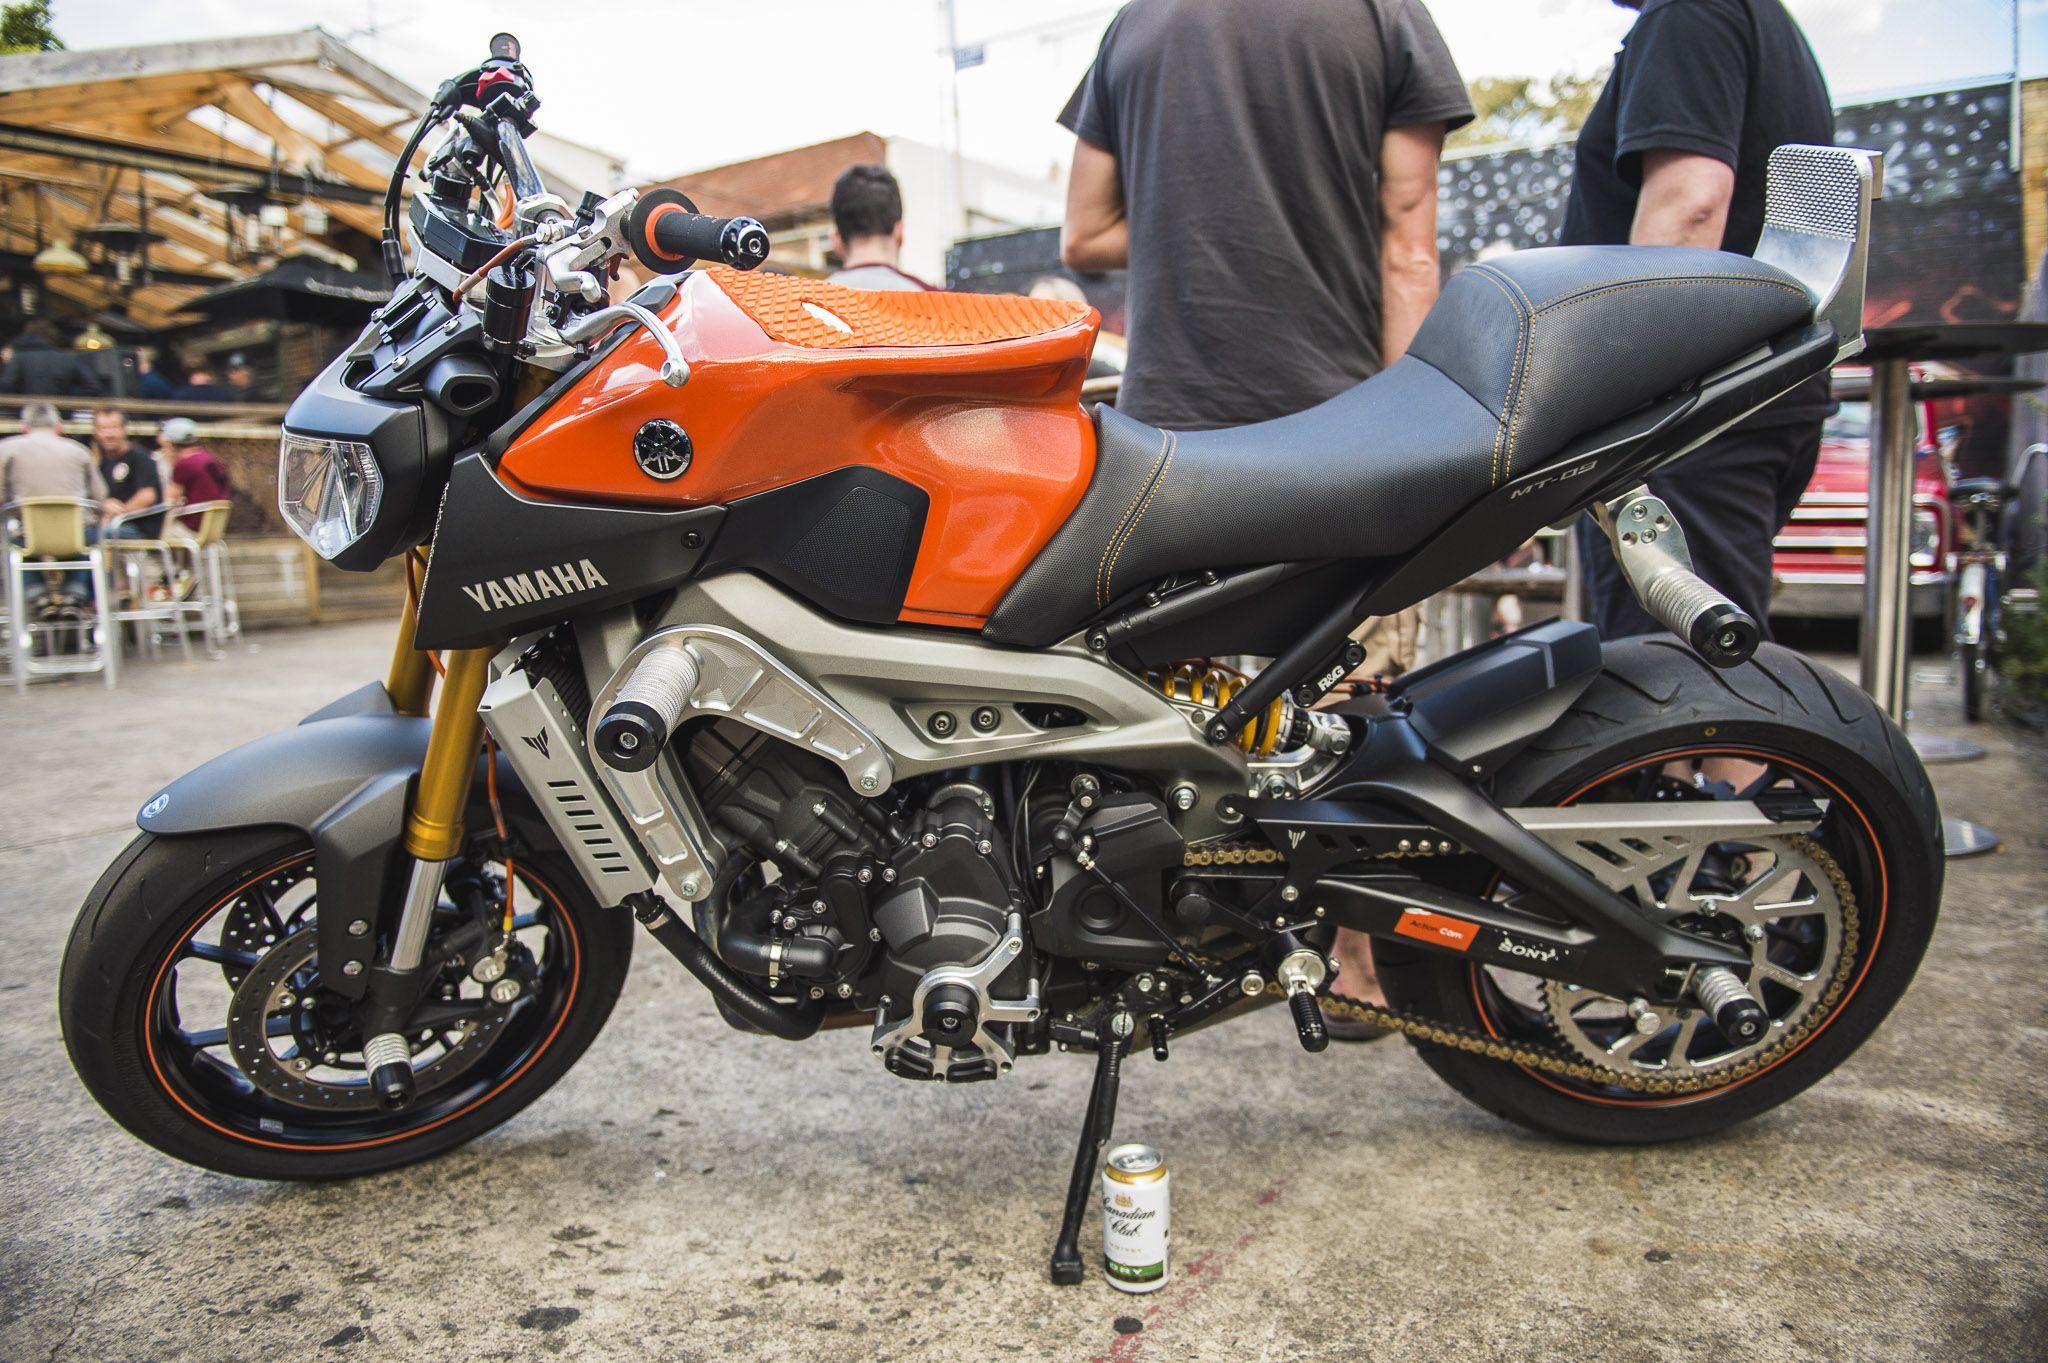 Dave Mckenna's stunt bike